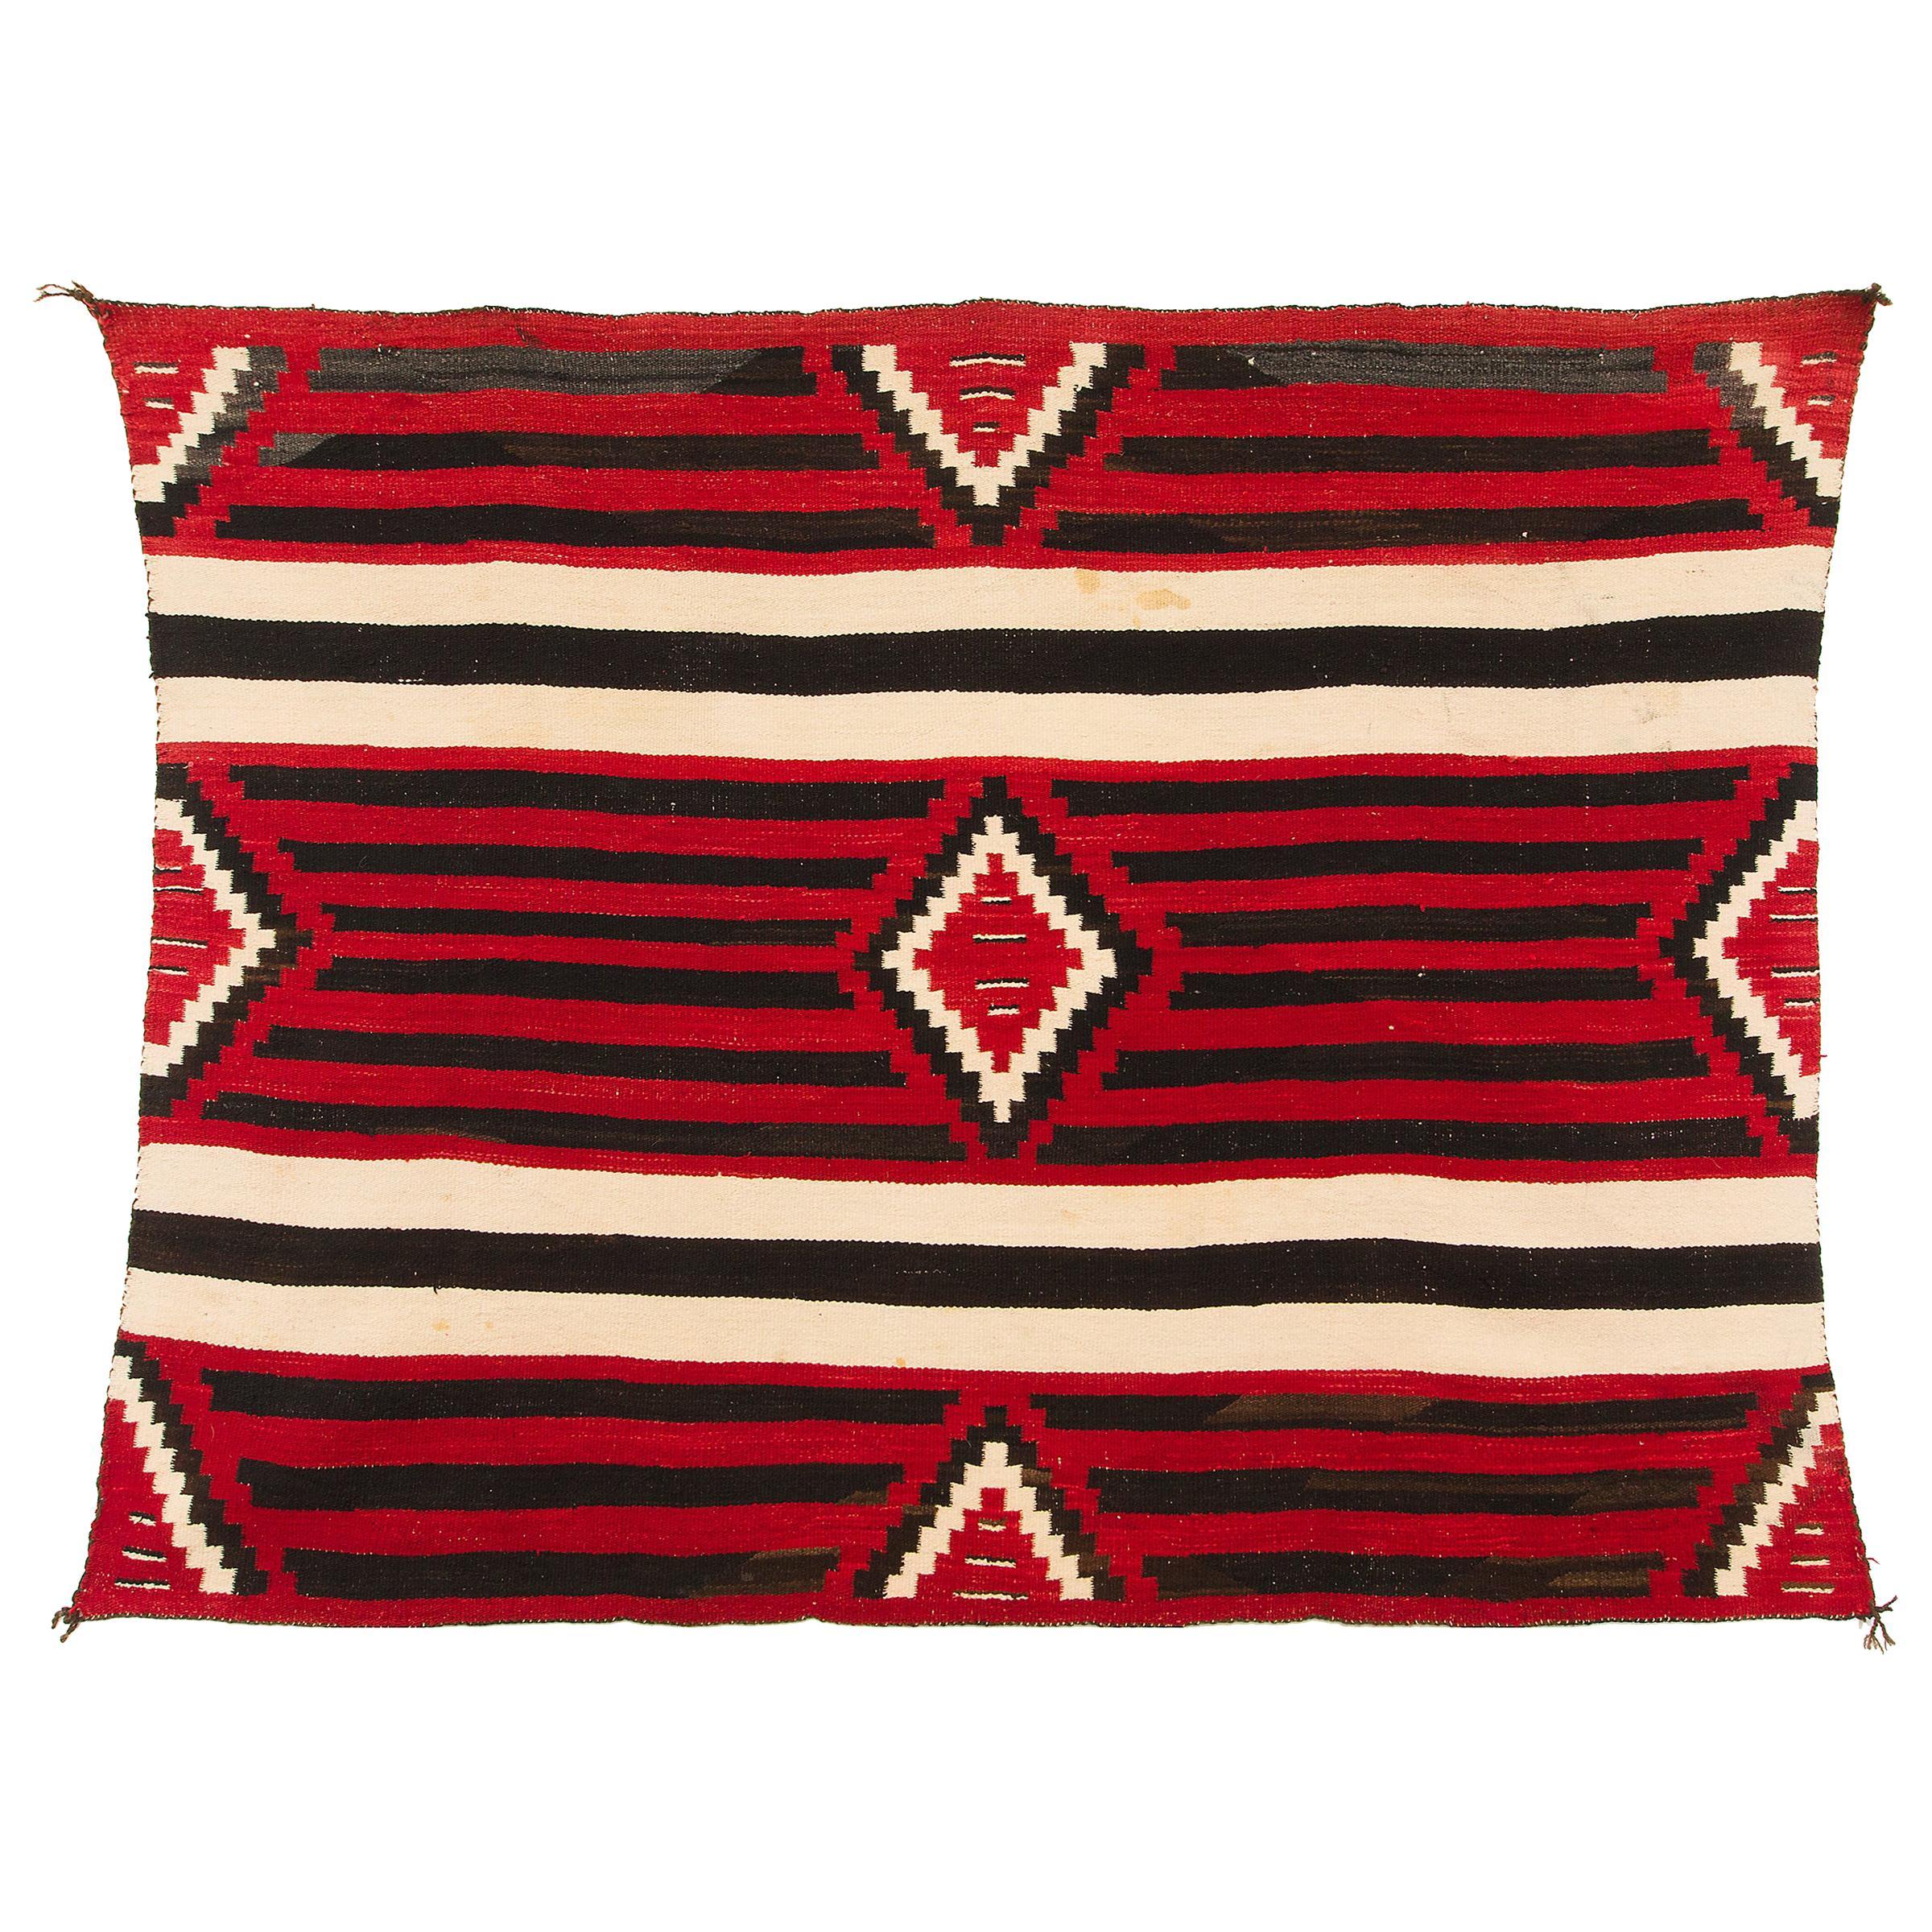 Vintage Navajo Chief's Blanket, 3rd Phase Pattern, circa 1900, Red, White, Black